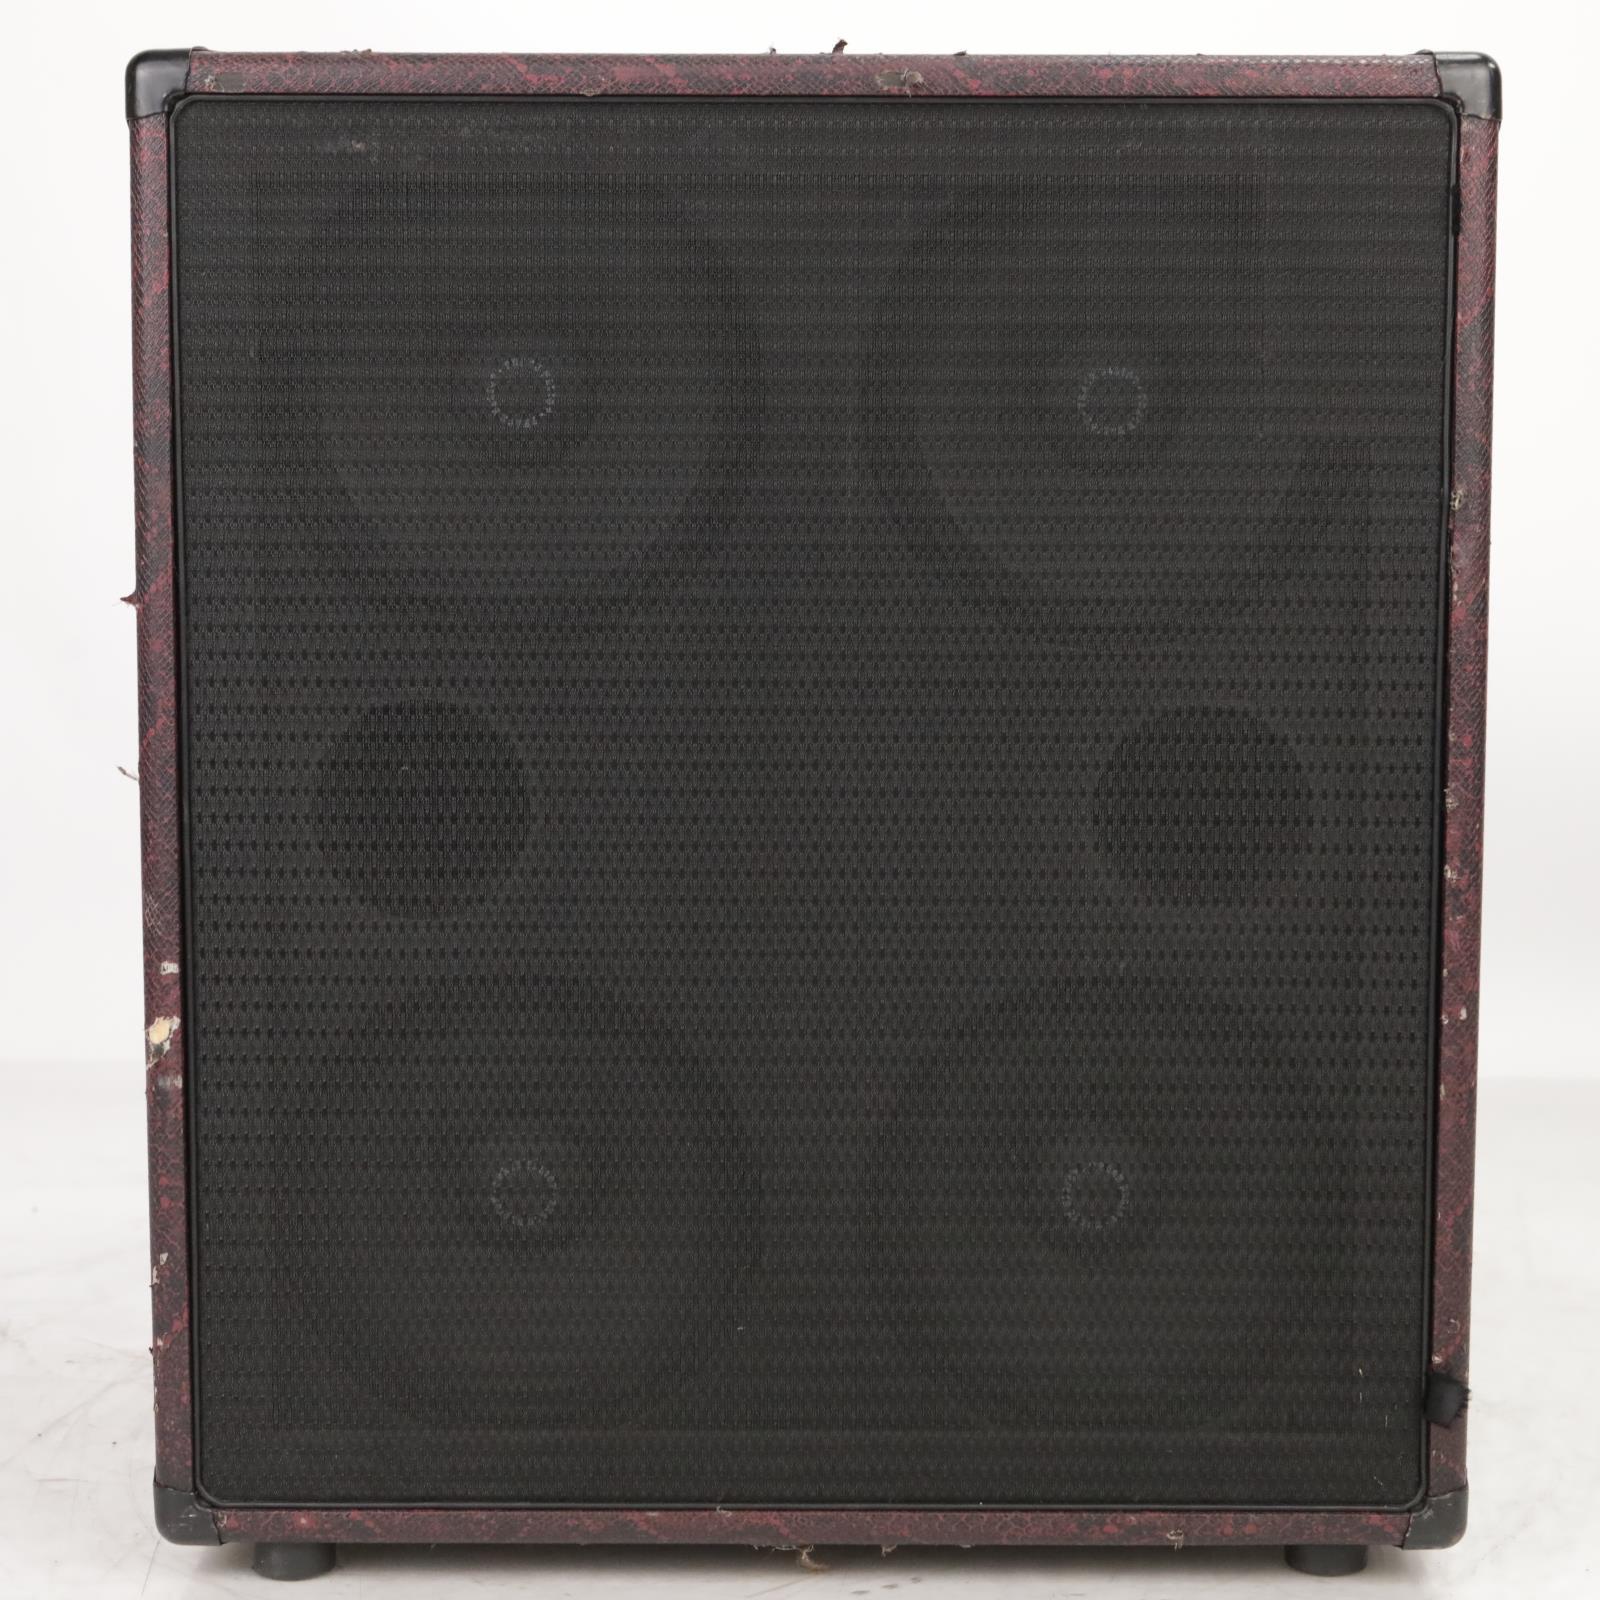 "Mojo Tone 4x10"" 400w 8Ohm Celestion Trace Elliot Bass Speaker Cabinet #37882"